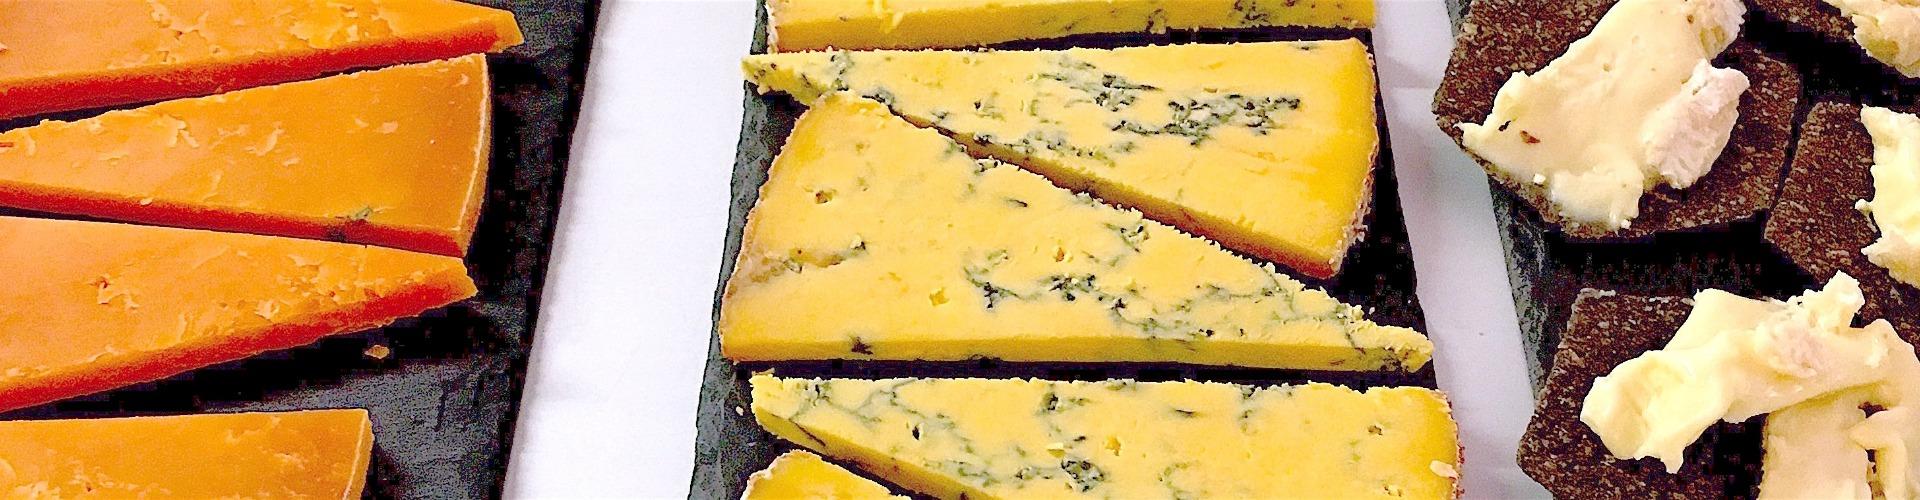 CFT Classic espresso cheese banner